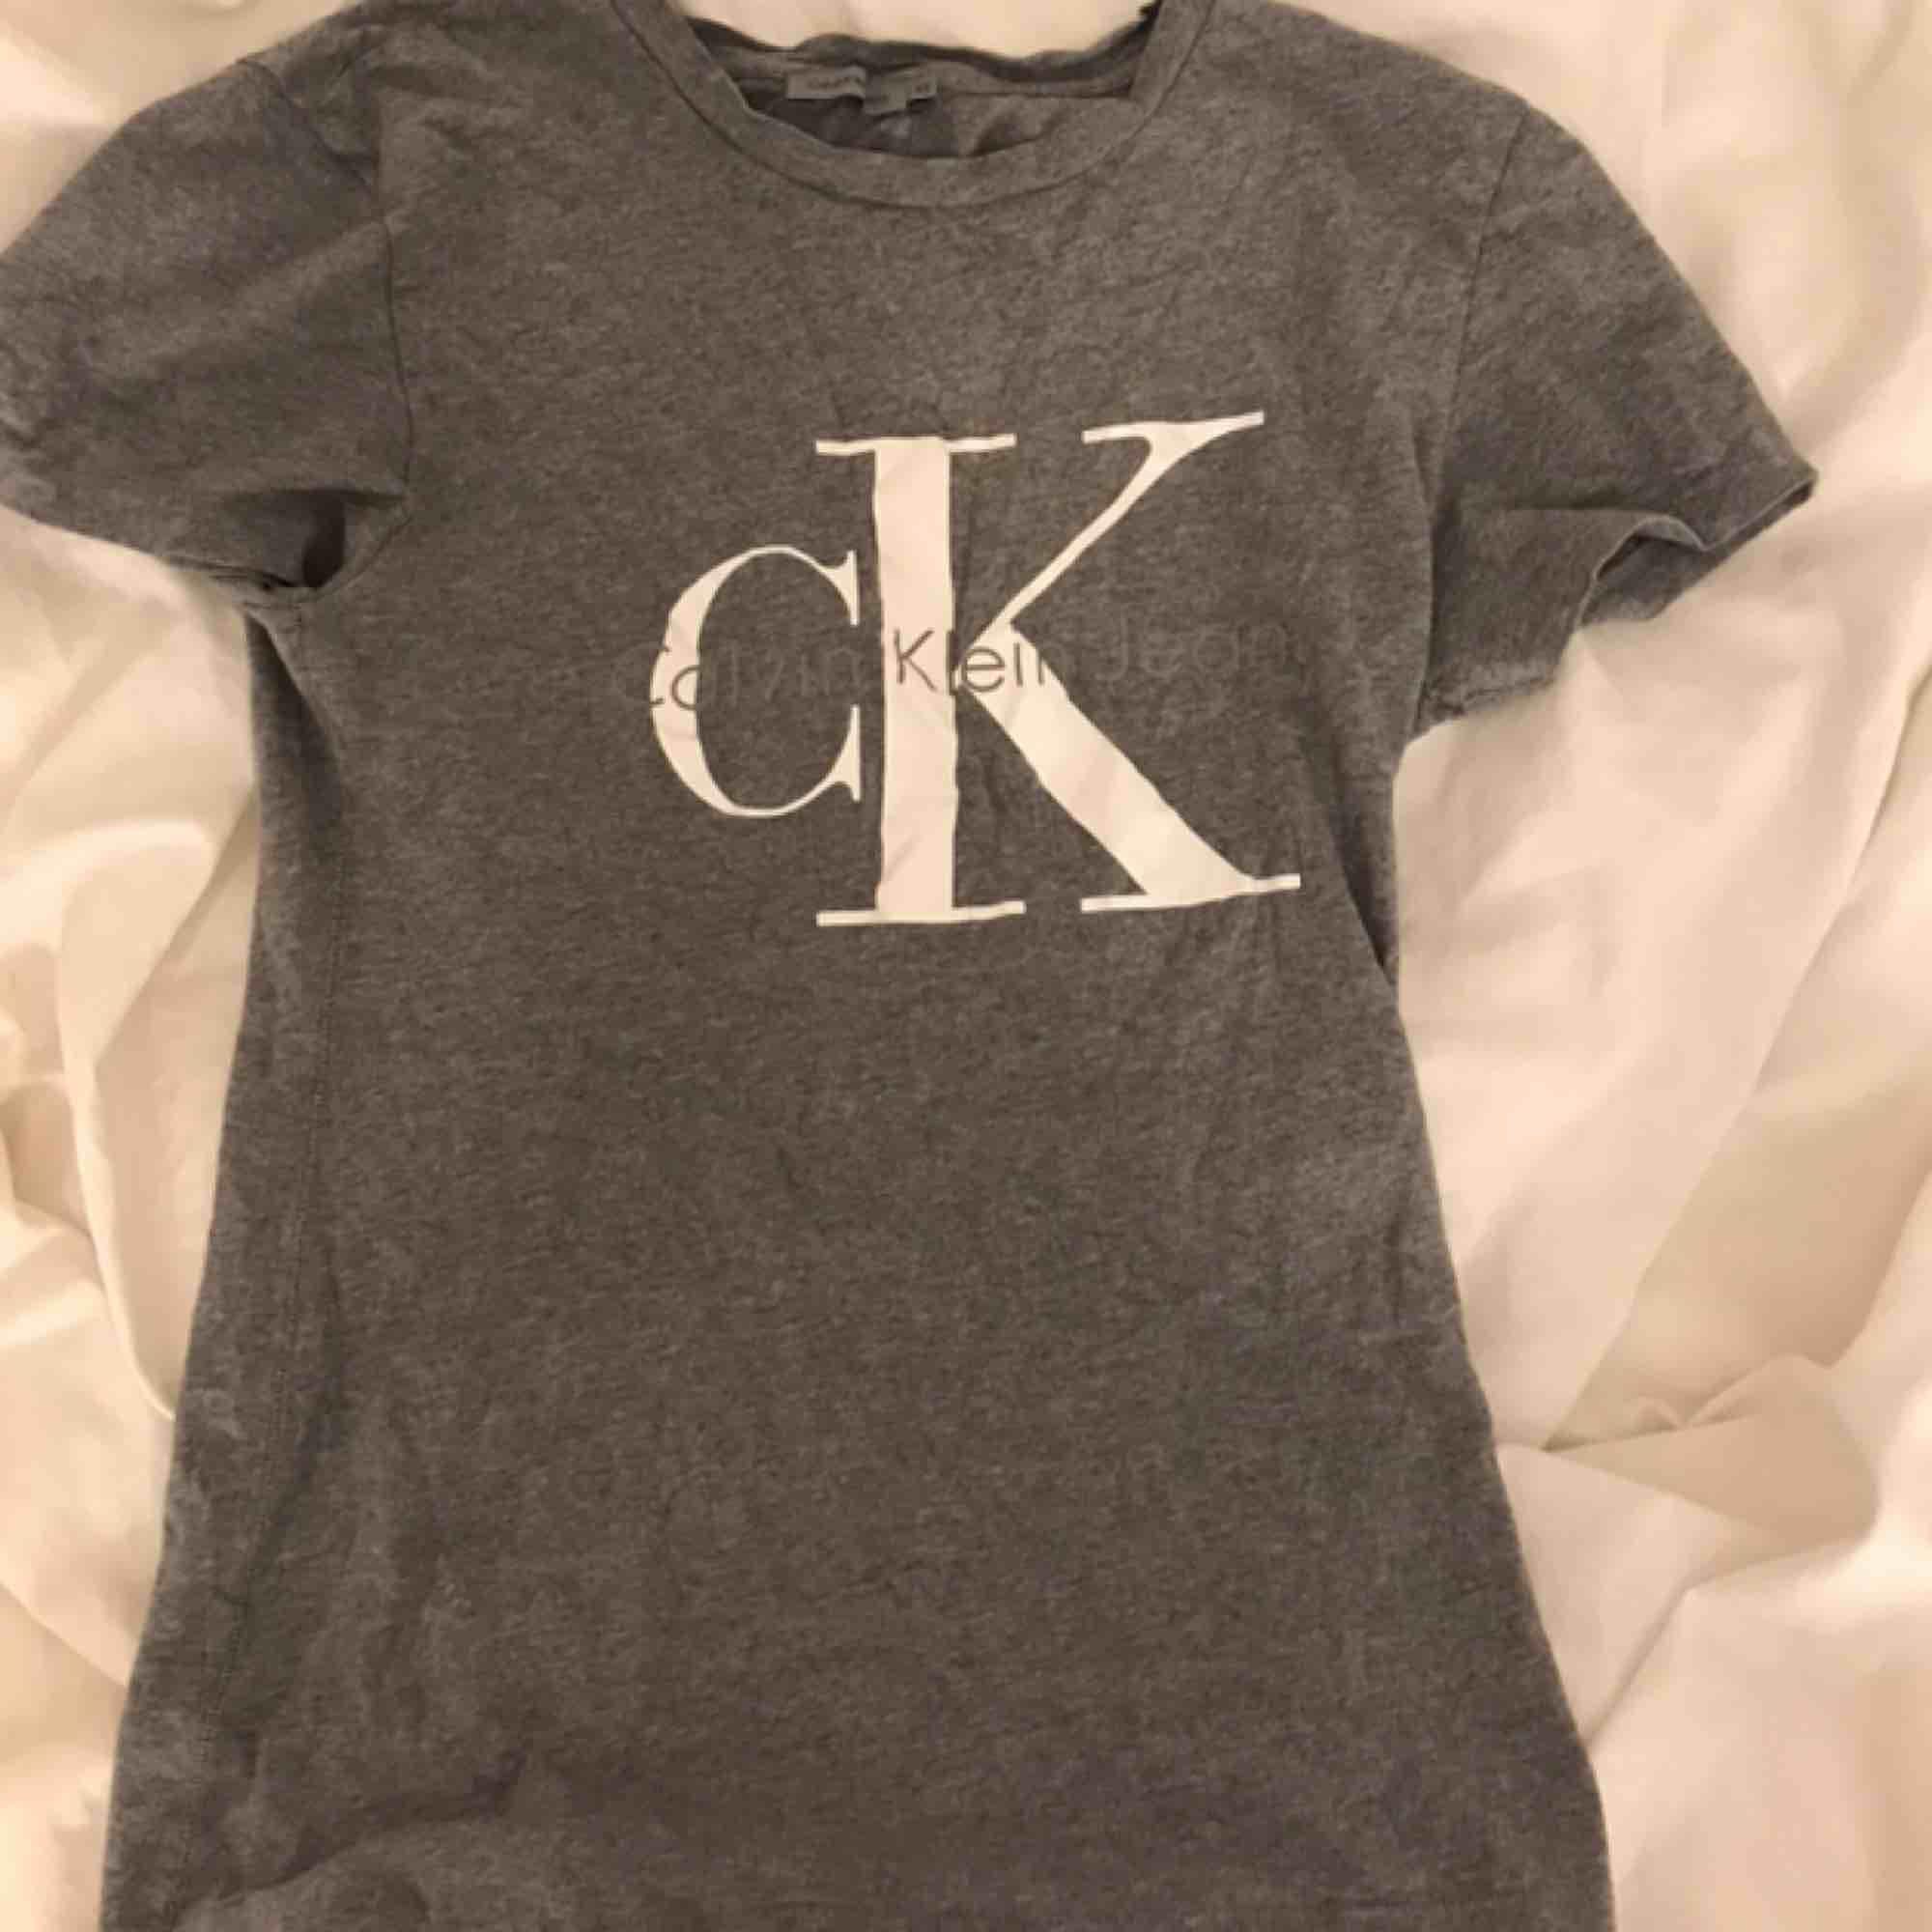 Grå T-shirt från Calvin Klein. T-shirts.